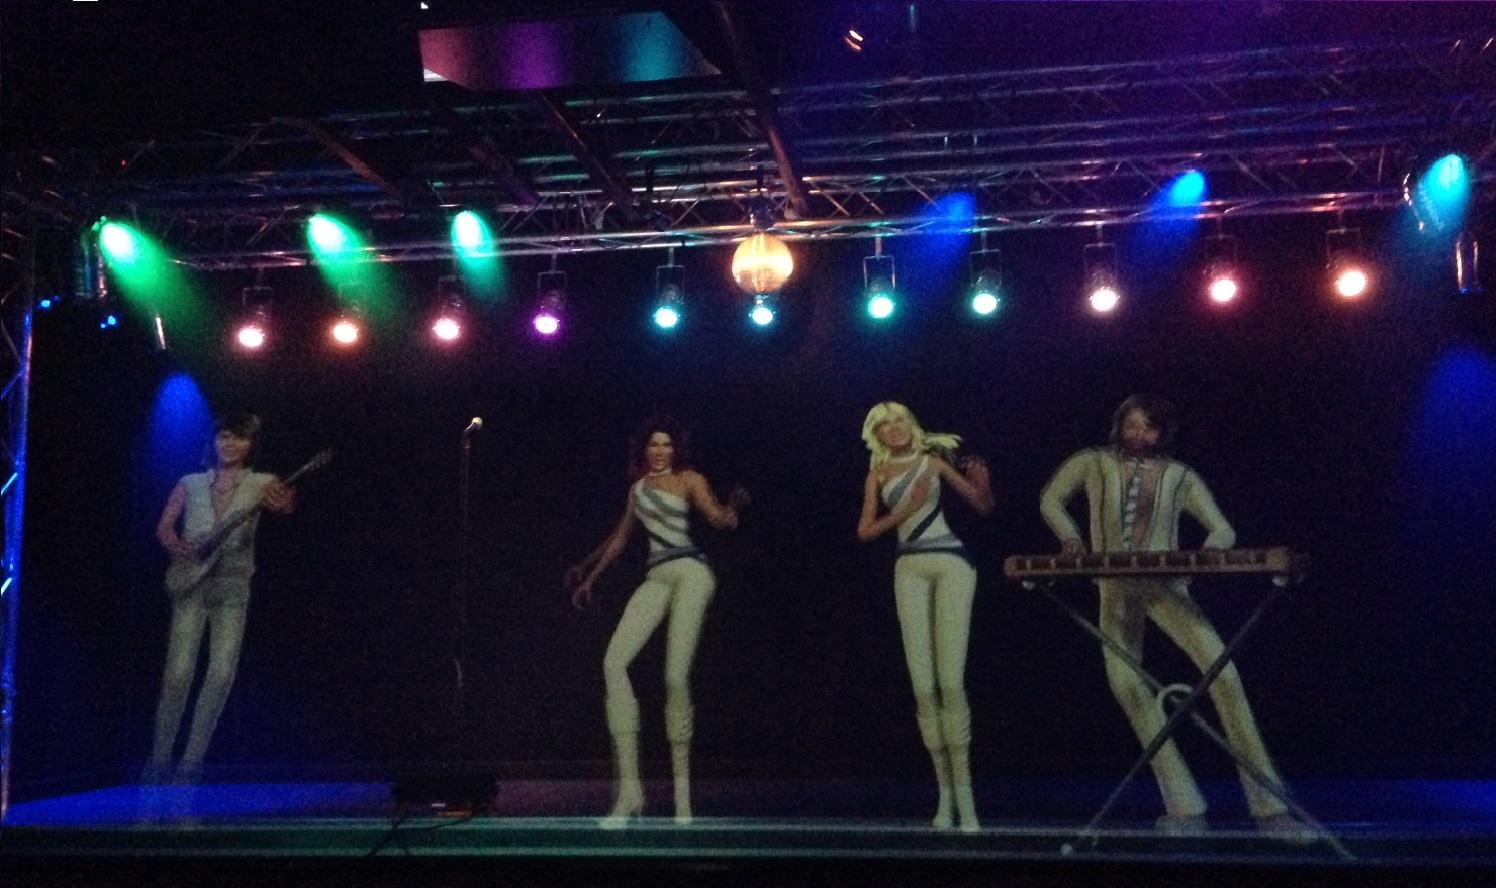 ABBA-projicering